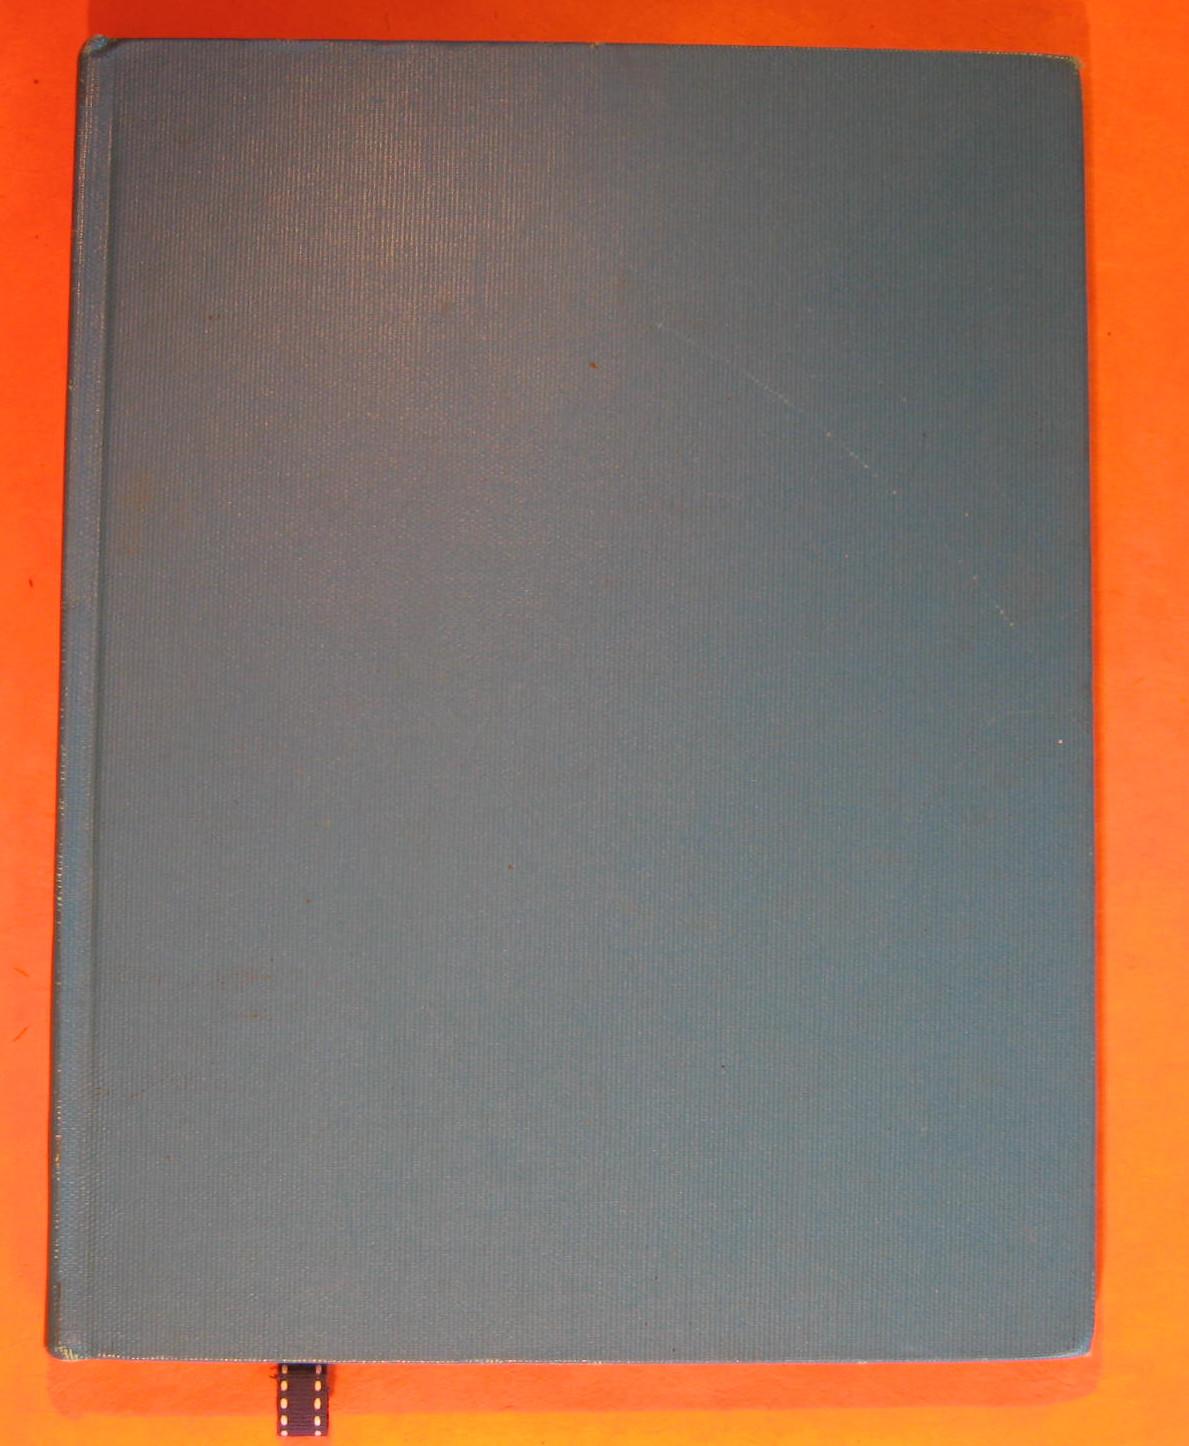 Blank Journal (Wallace-Homestead Oriental Primer) / Blank Book / Diary / Sketch Book